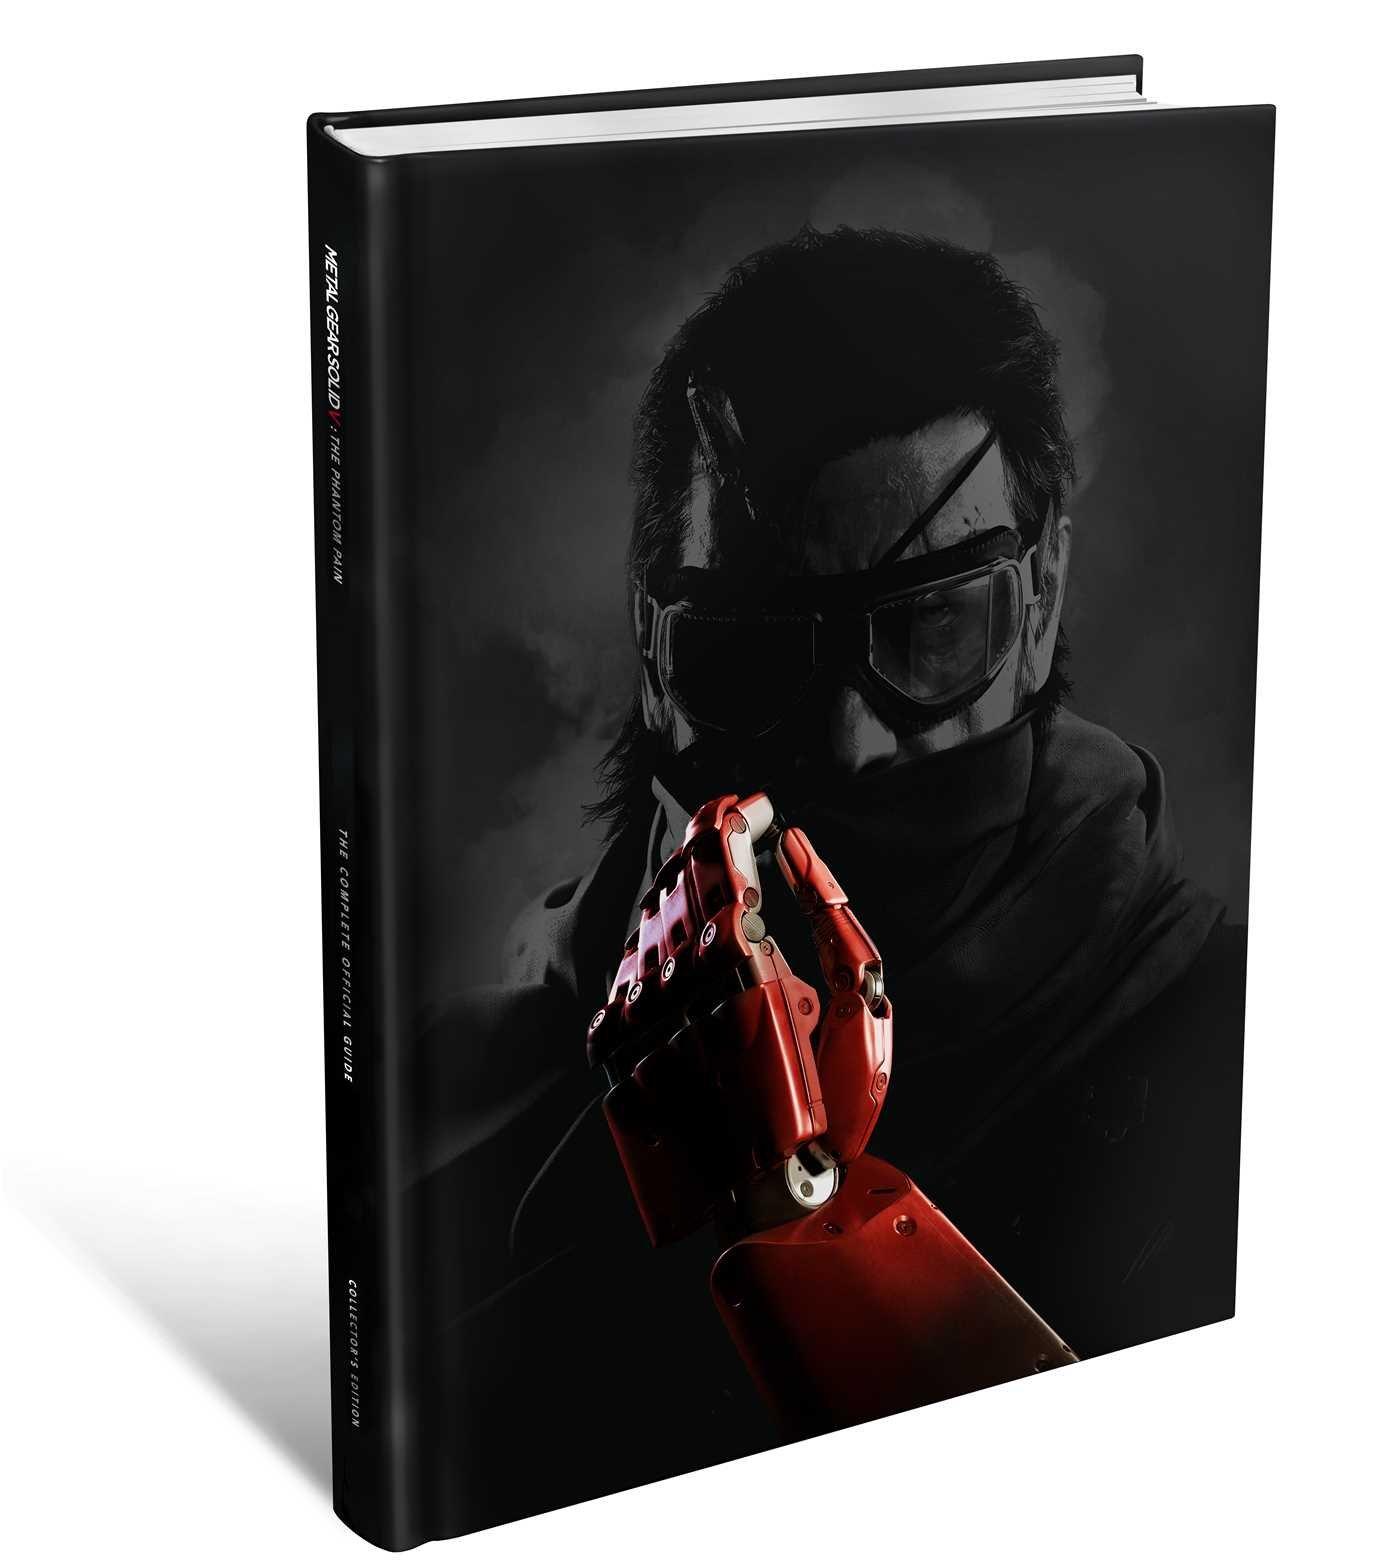 20 minut z Metal Gear Solid V: The Phantom Pain 109824